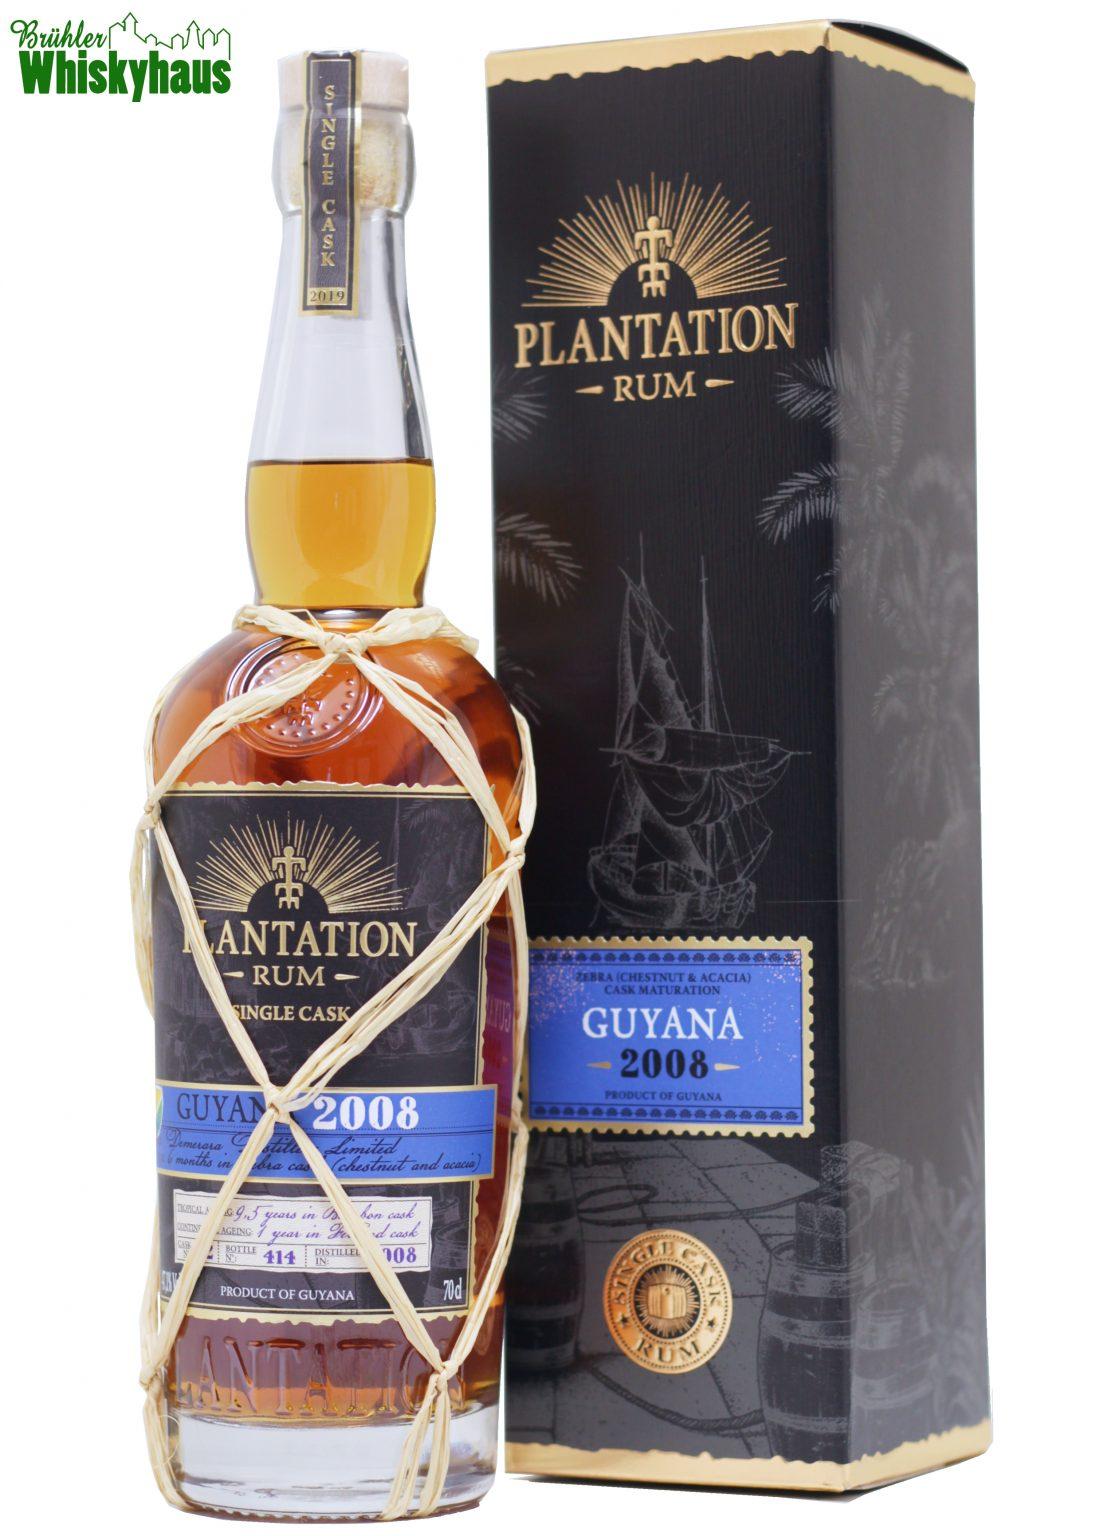 Guyana 11 Jahre - Vintage 2008 - Cask No. 02 - Kastanie & Akazie Cask Finish - Plantation Single Cask Rum